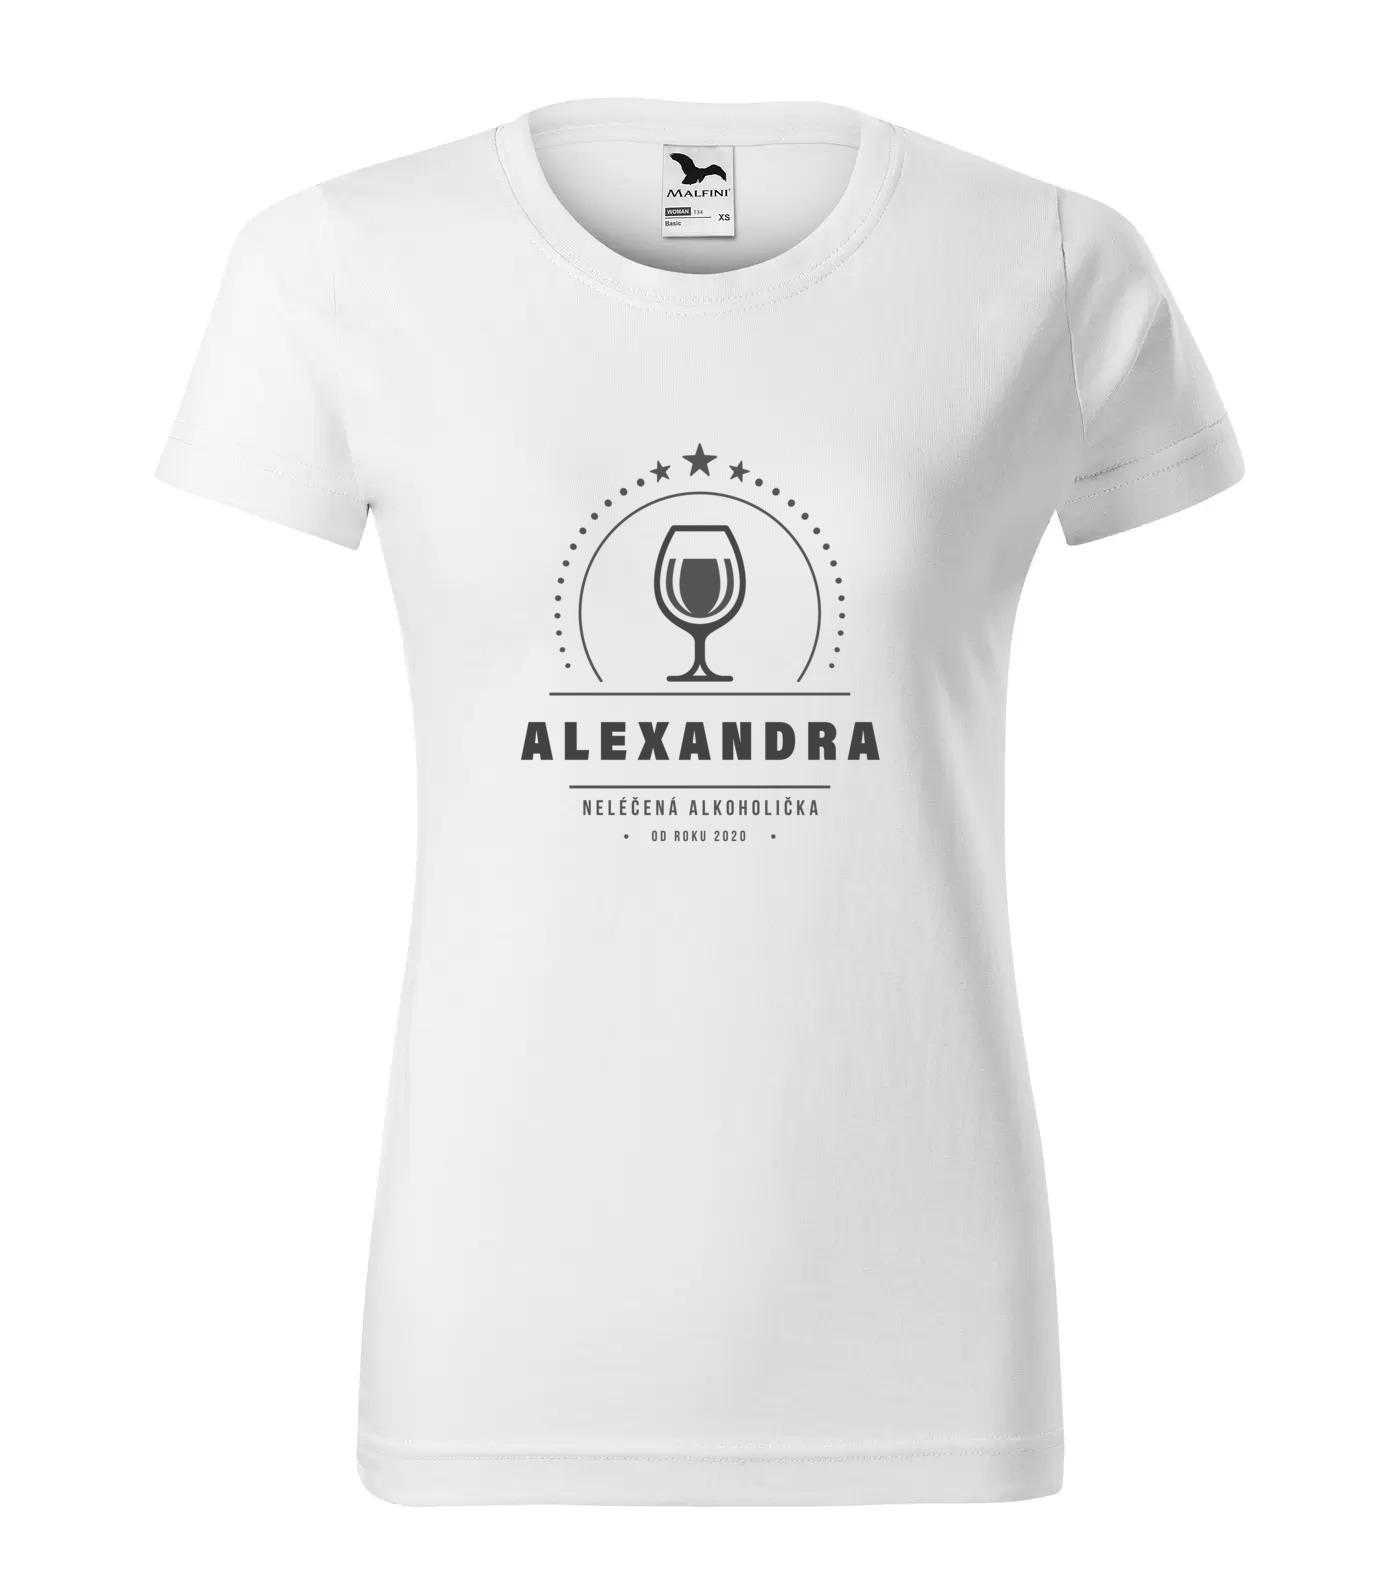 Tričko Alkoholička Alexandra